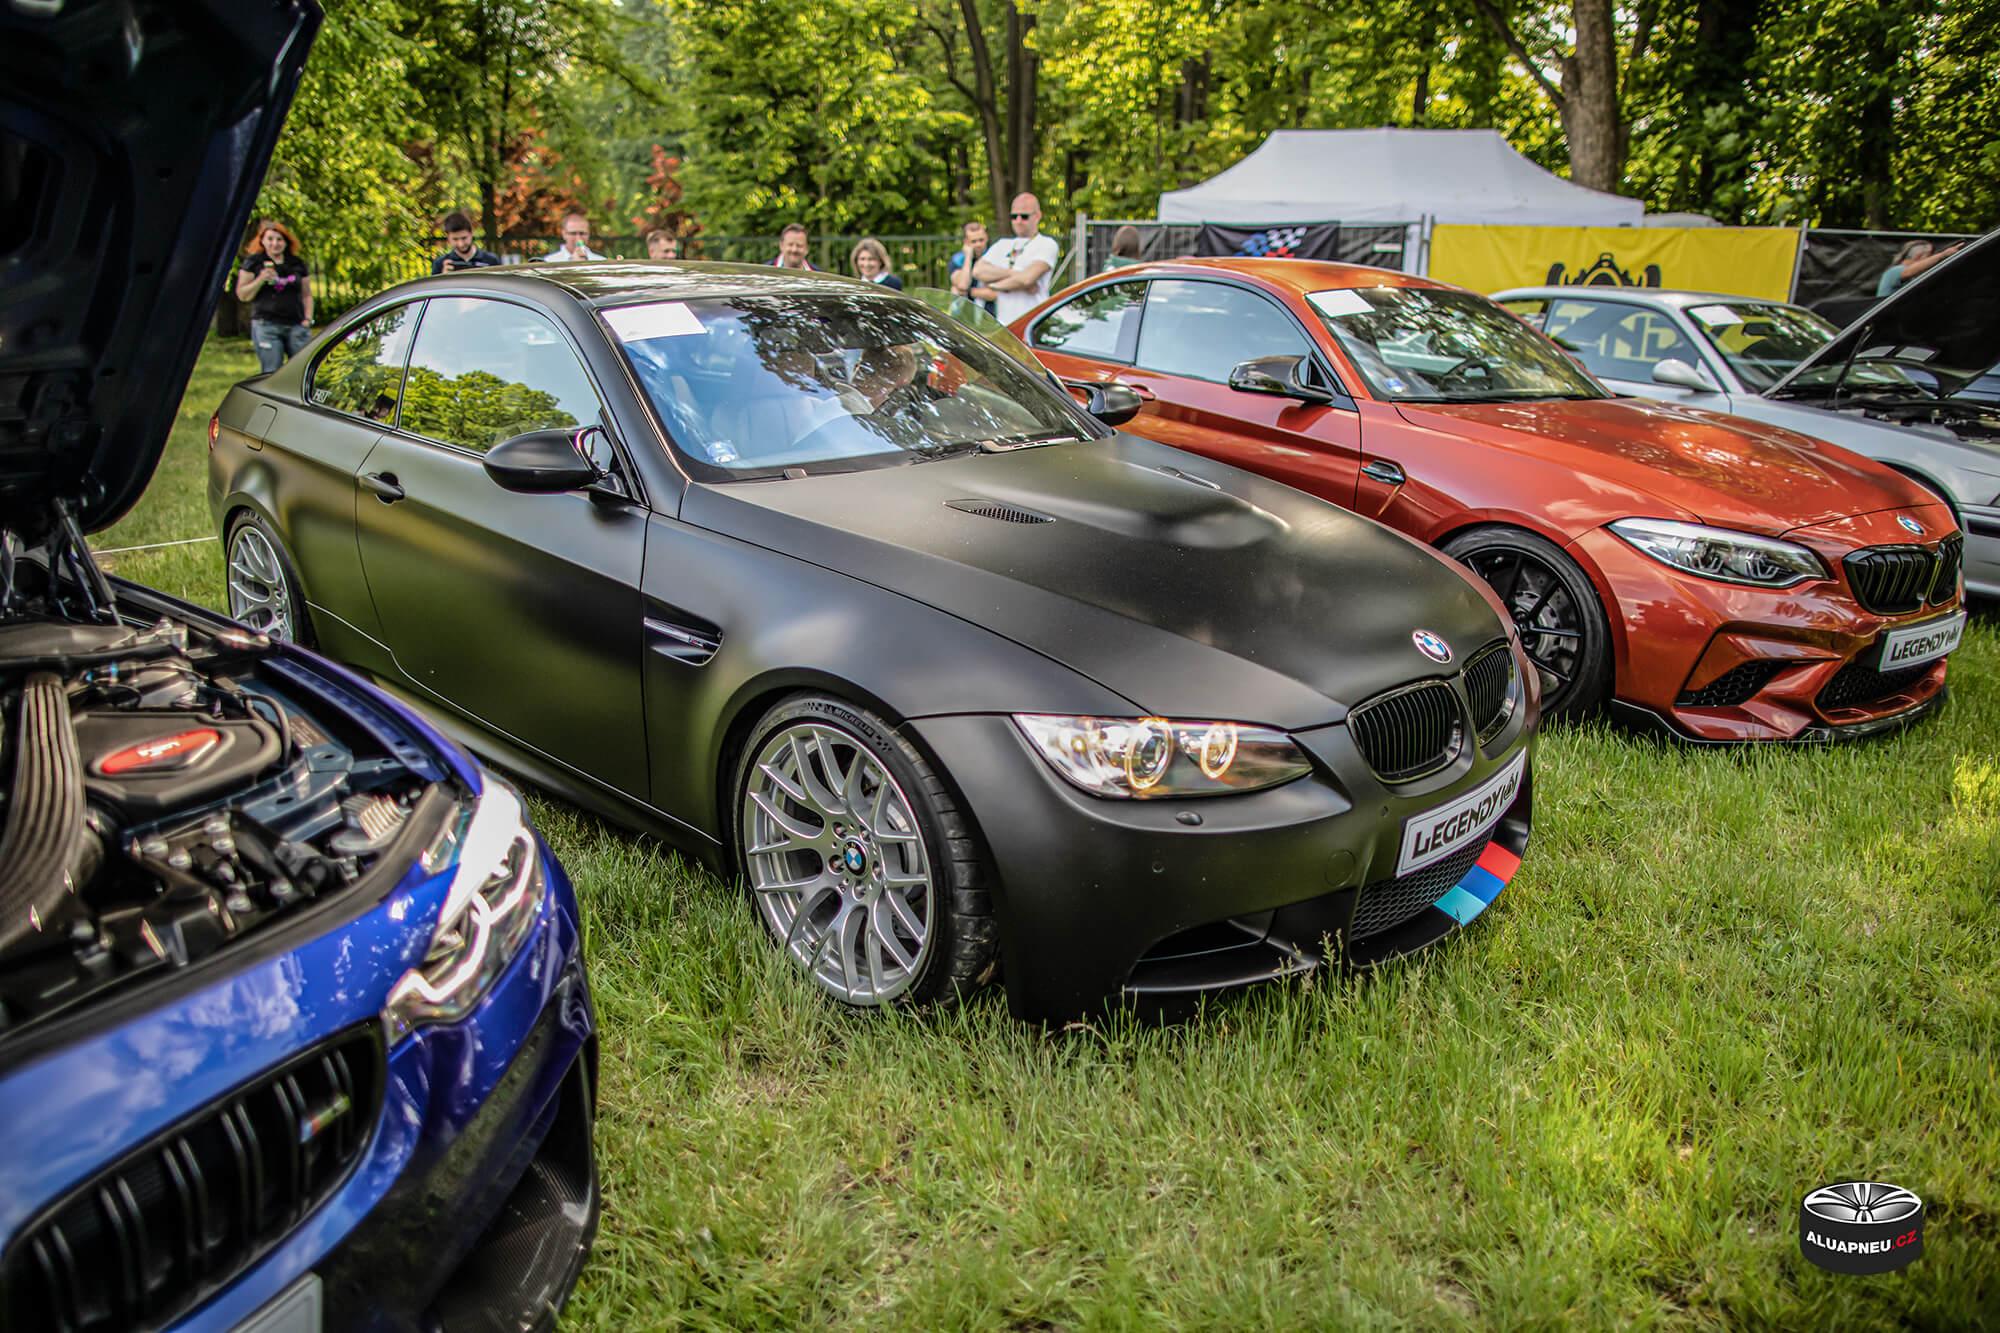 Original alukola Bmw Motorsport - Bmw M3 e90 - Automobilové Legendy 2019 - www.aluapneu.cz